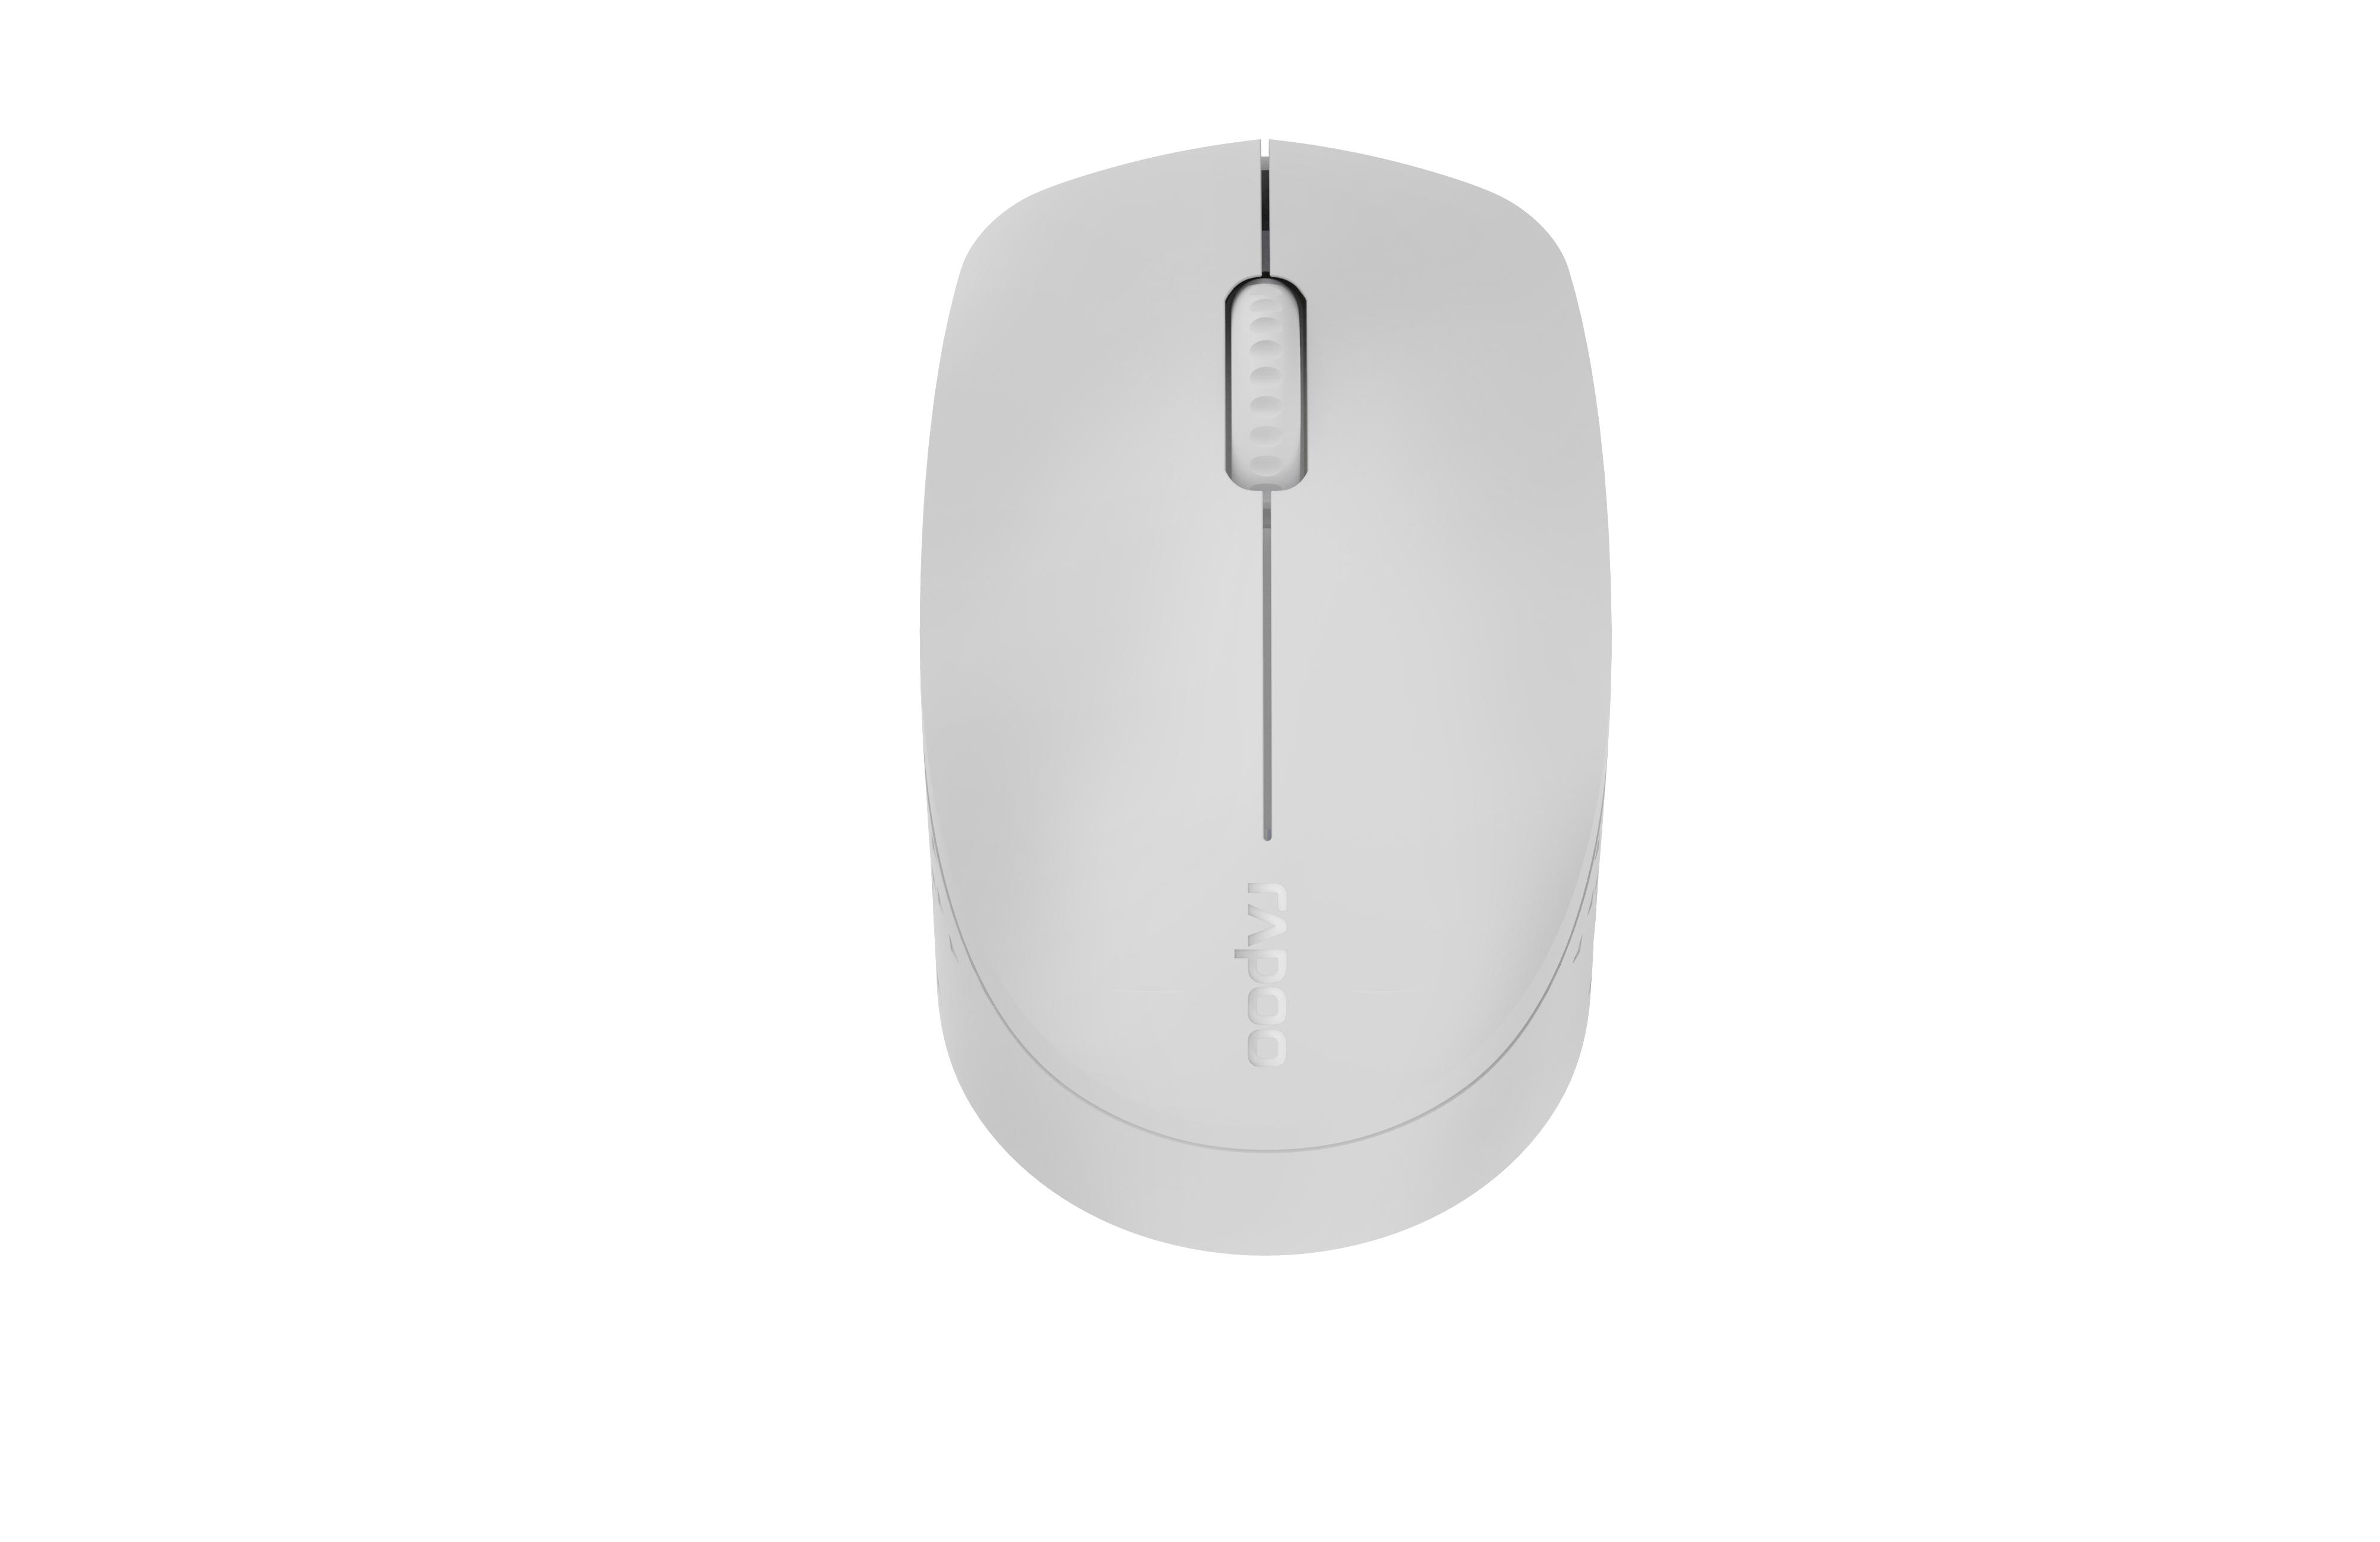 Безжична оптична мишка RAPOO M100 Silent, Multi-mode, безшумна, Светло сива